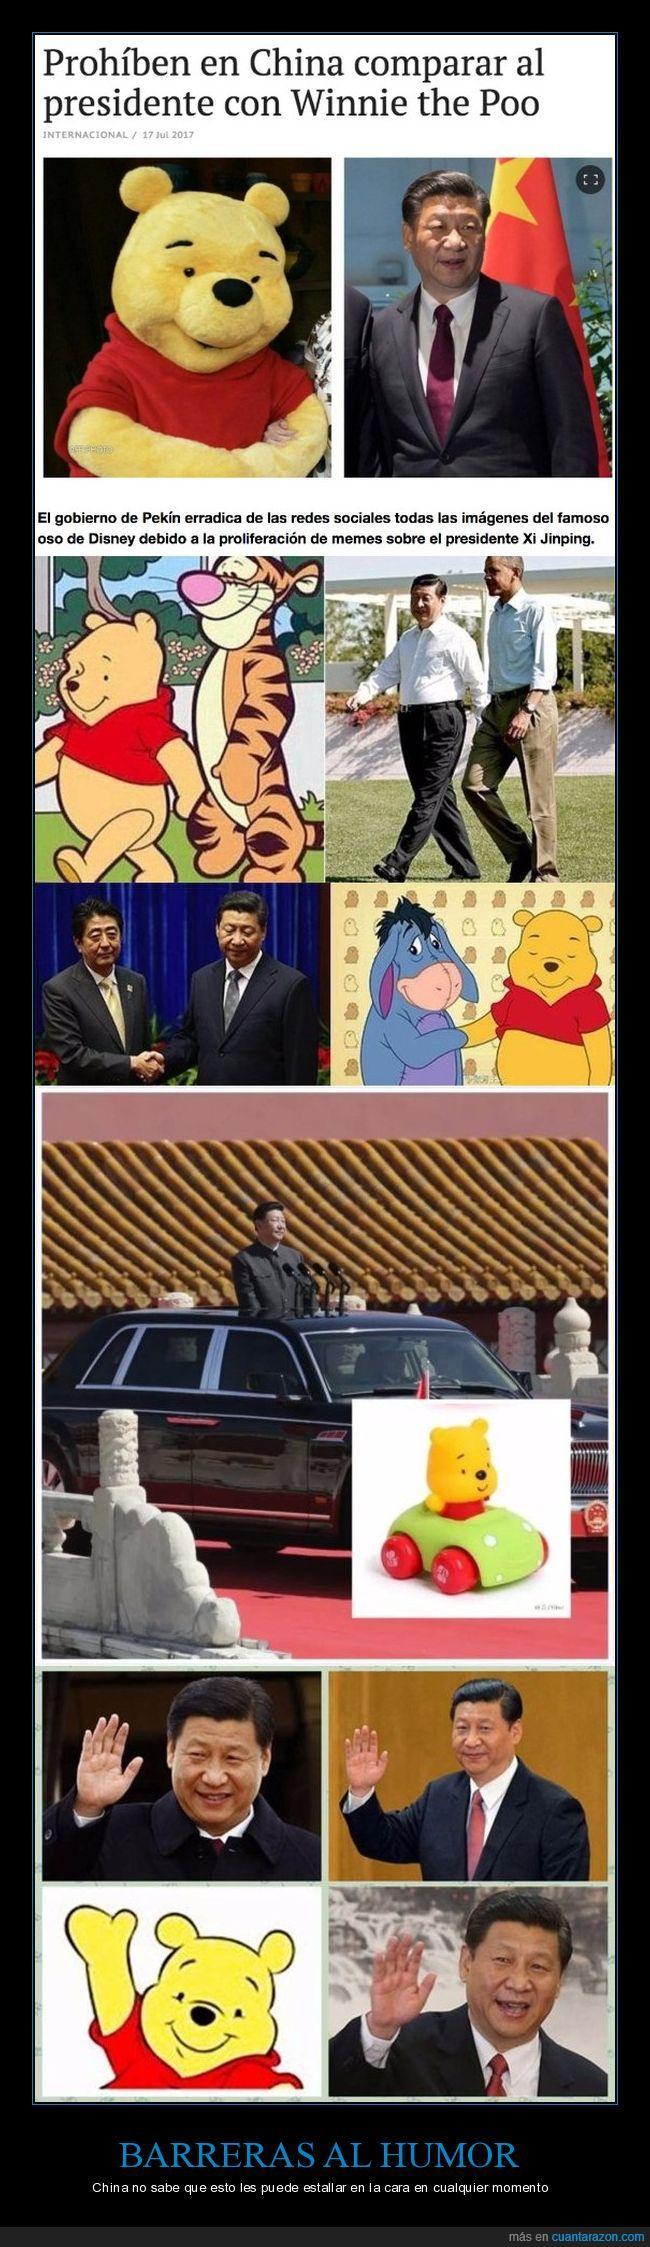 chinos,presidentes,winnie the pooh